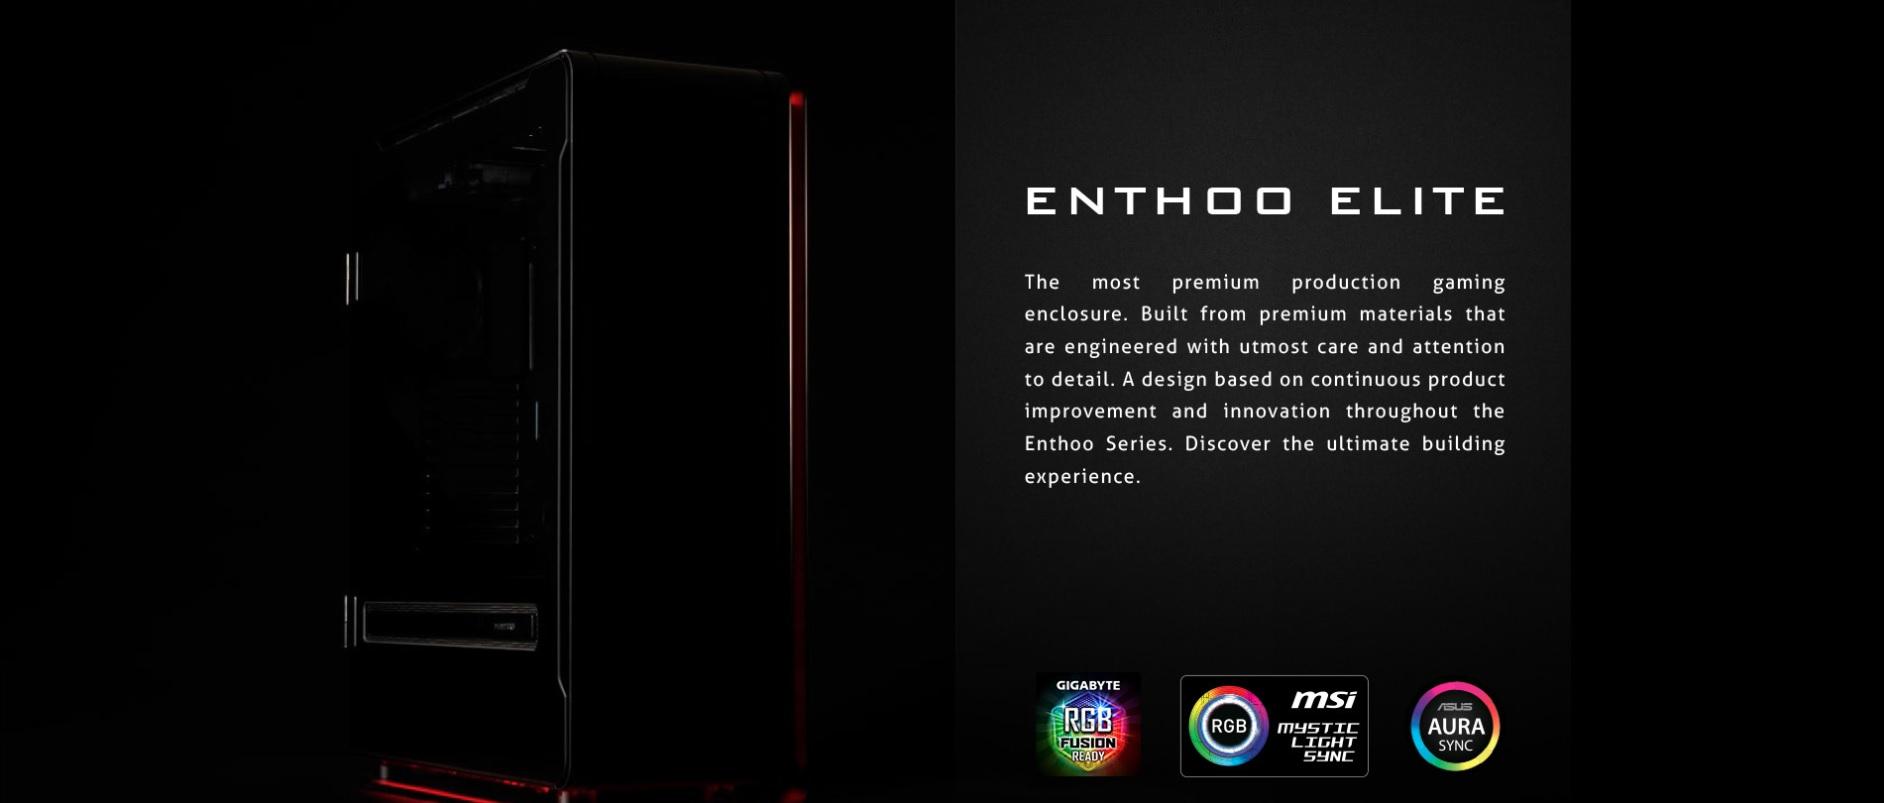 Phanteks Enthoo Elite Extreme RGB Lighting, Tempered Glass Window, Dual System Support giới thiệu